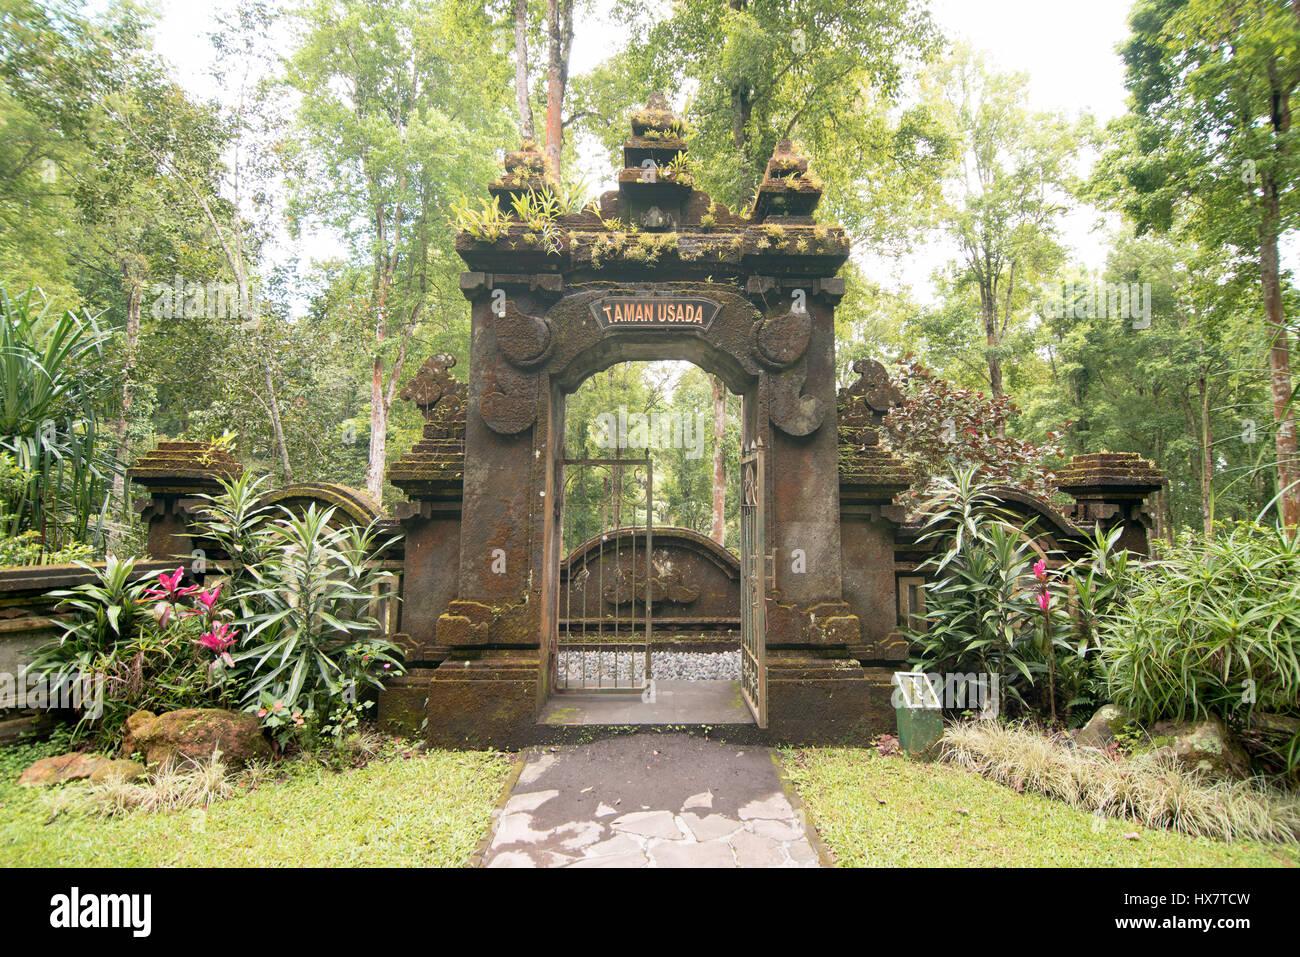 Taman Usada, Kebun Raya Bali in Ubud - Stock Image